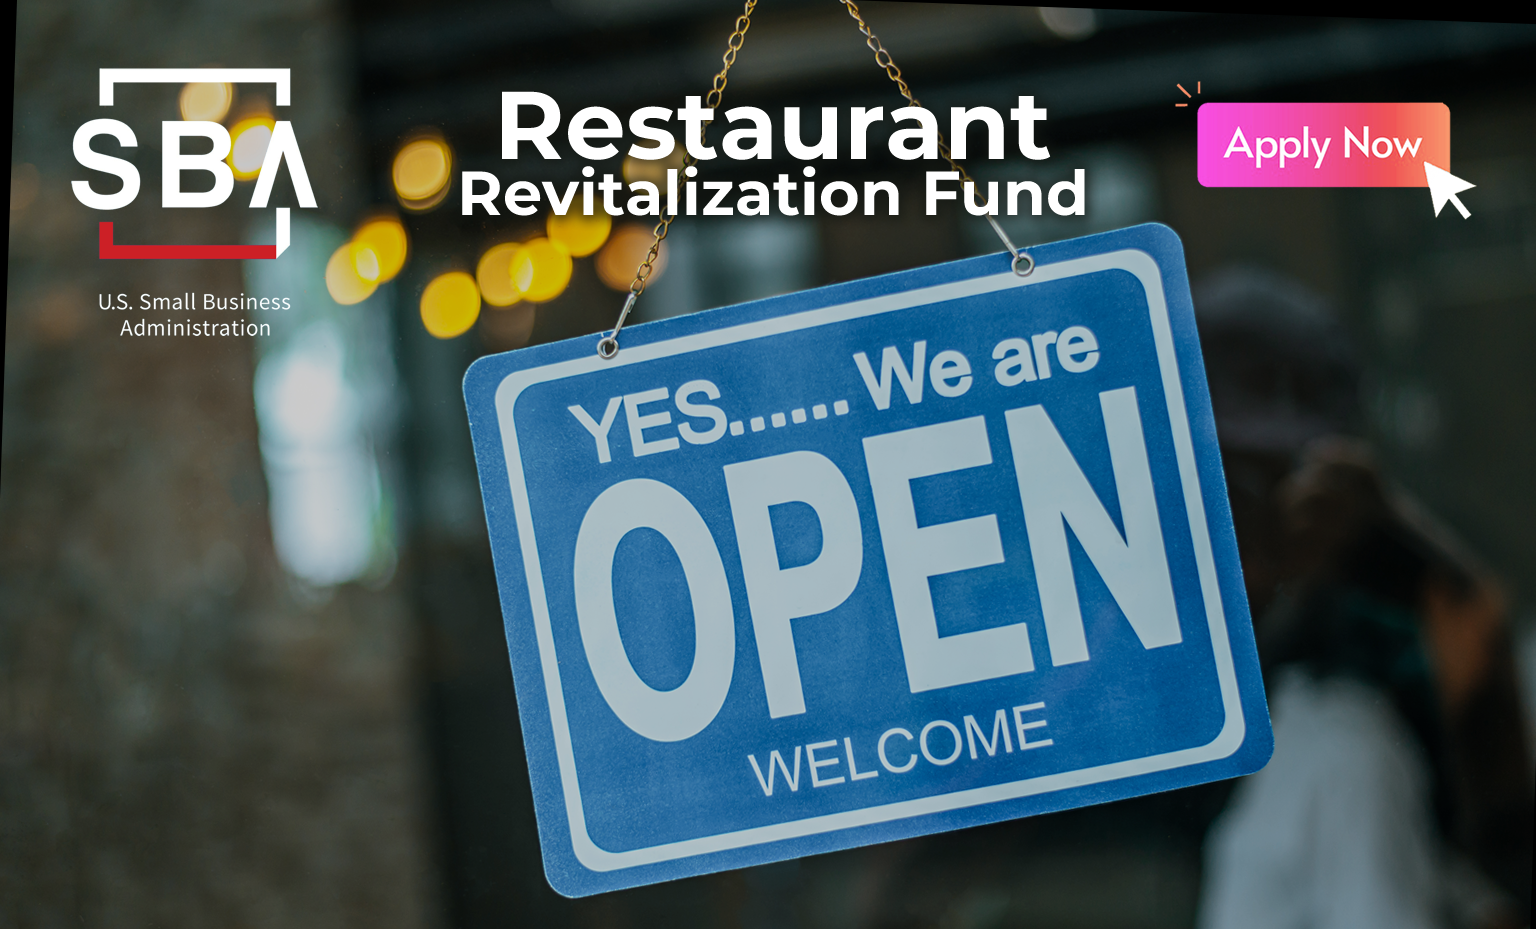 SBA: Restaurant Revitalization Fund